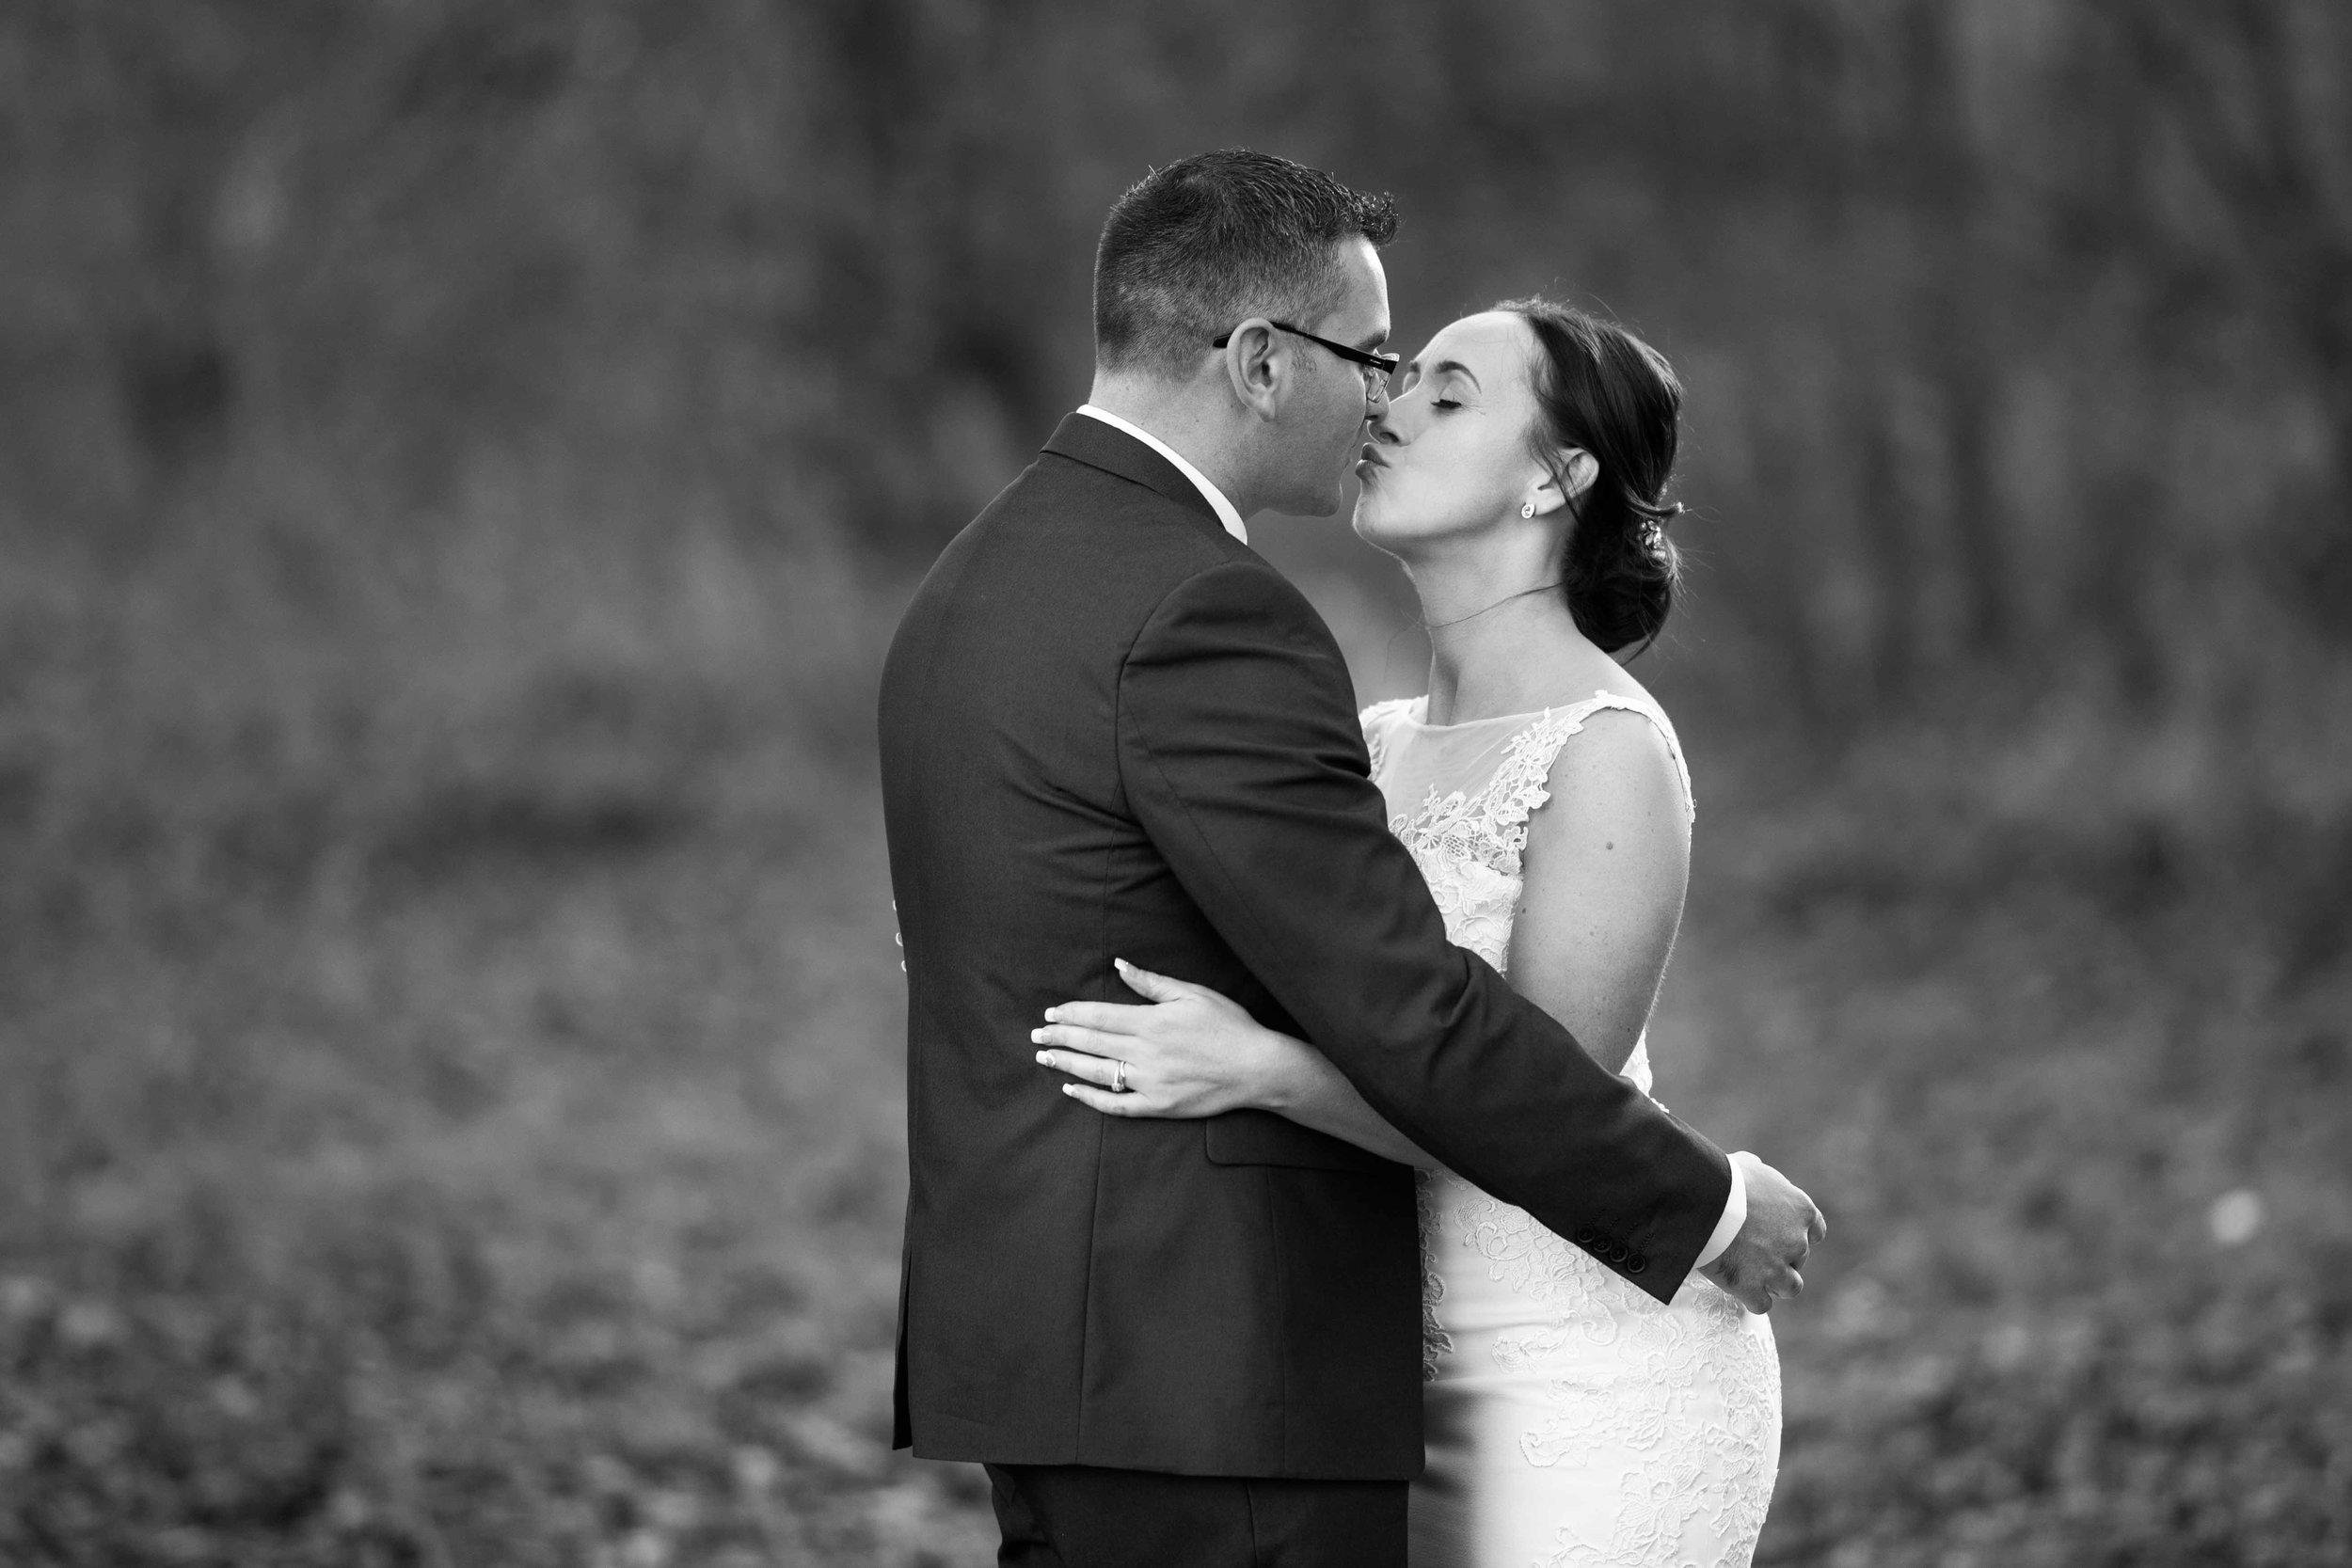 wedding-photos-willenhall-wedding-photographer-wolverhampton-wedding-photographer-west-midlands-wedding-photographer-birmingham-co.jpg